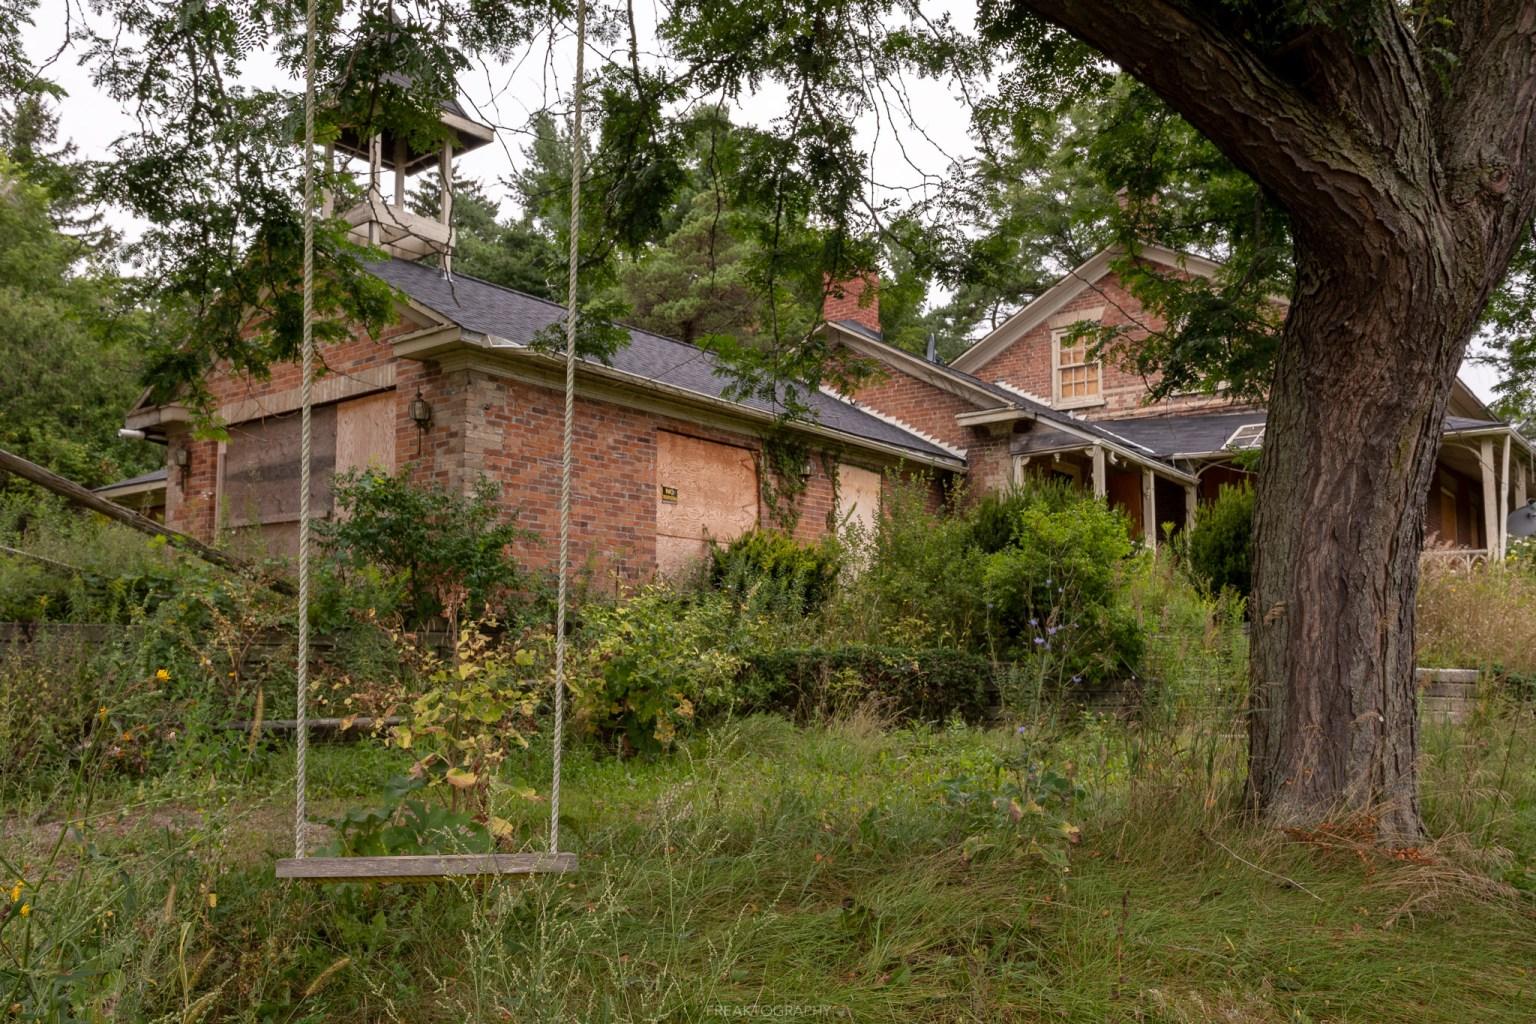 Gummerson-Thorpe House